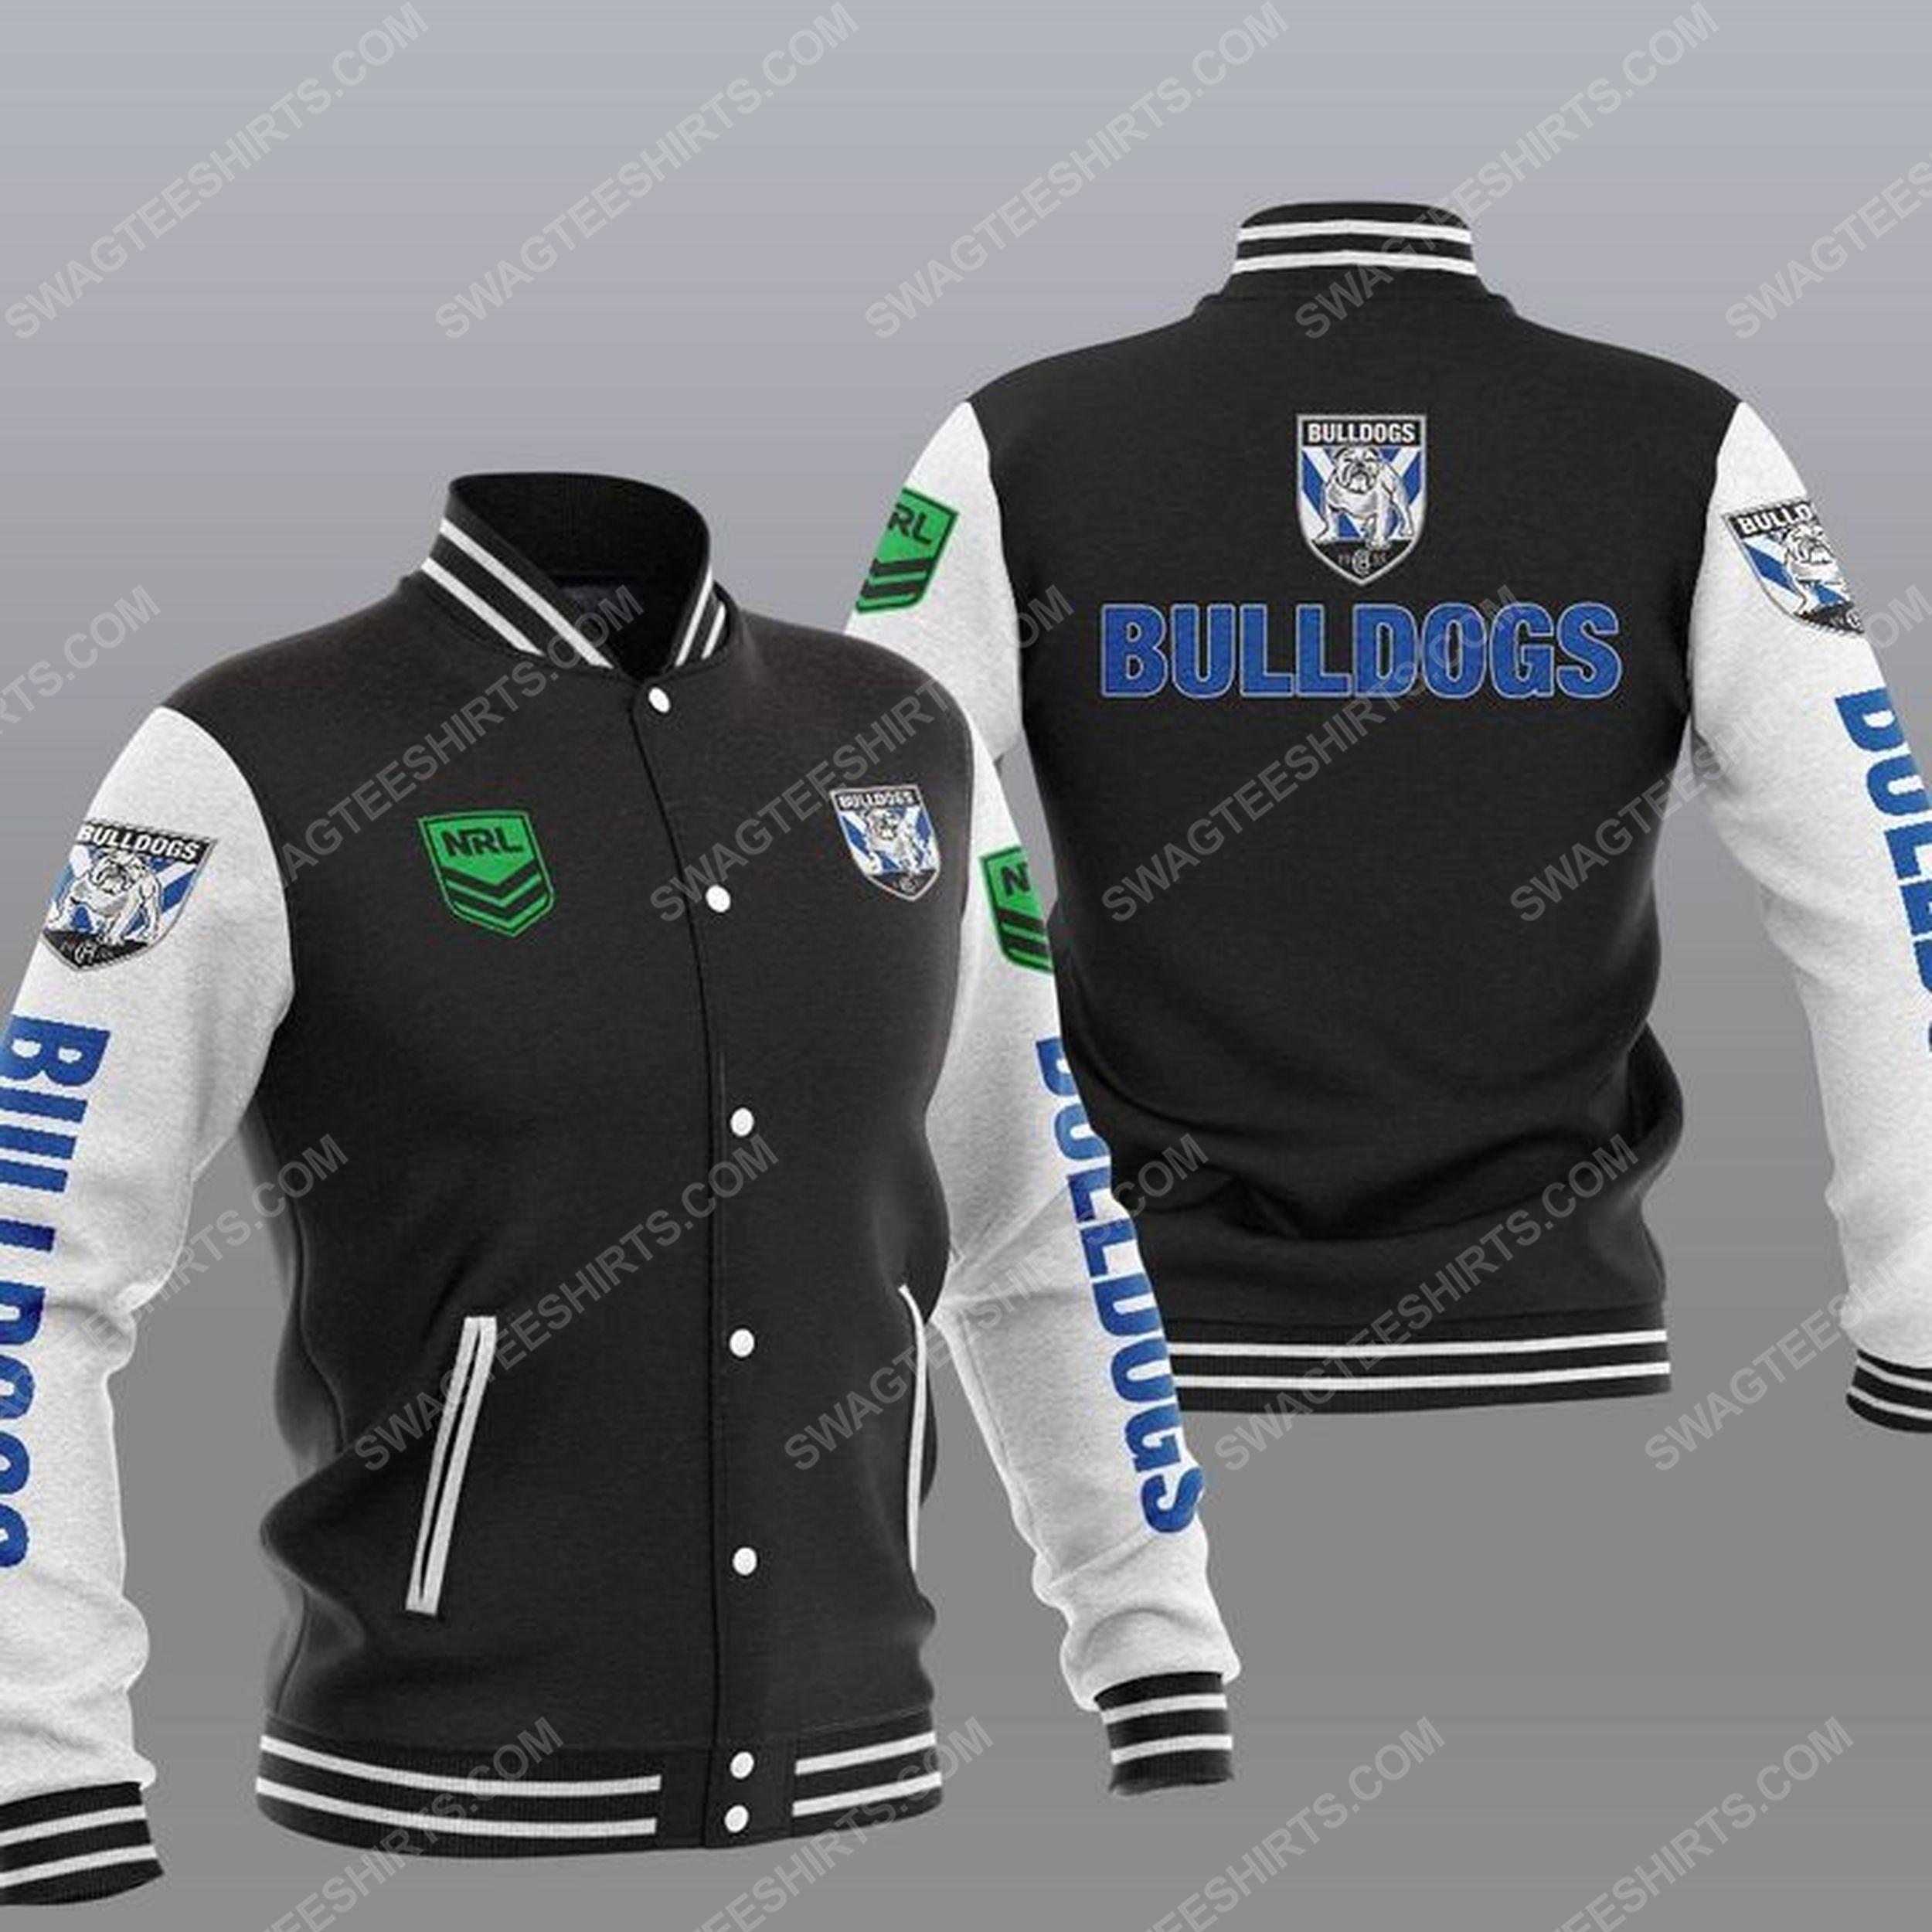 Canterbury-bankstown bulldogs all over print baseball jacket - black 1